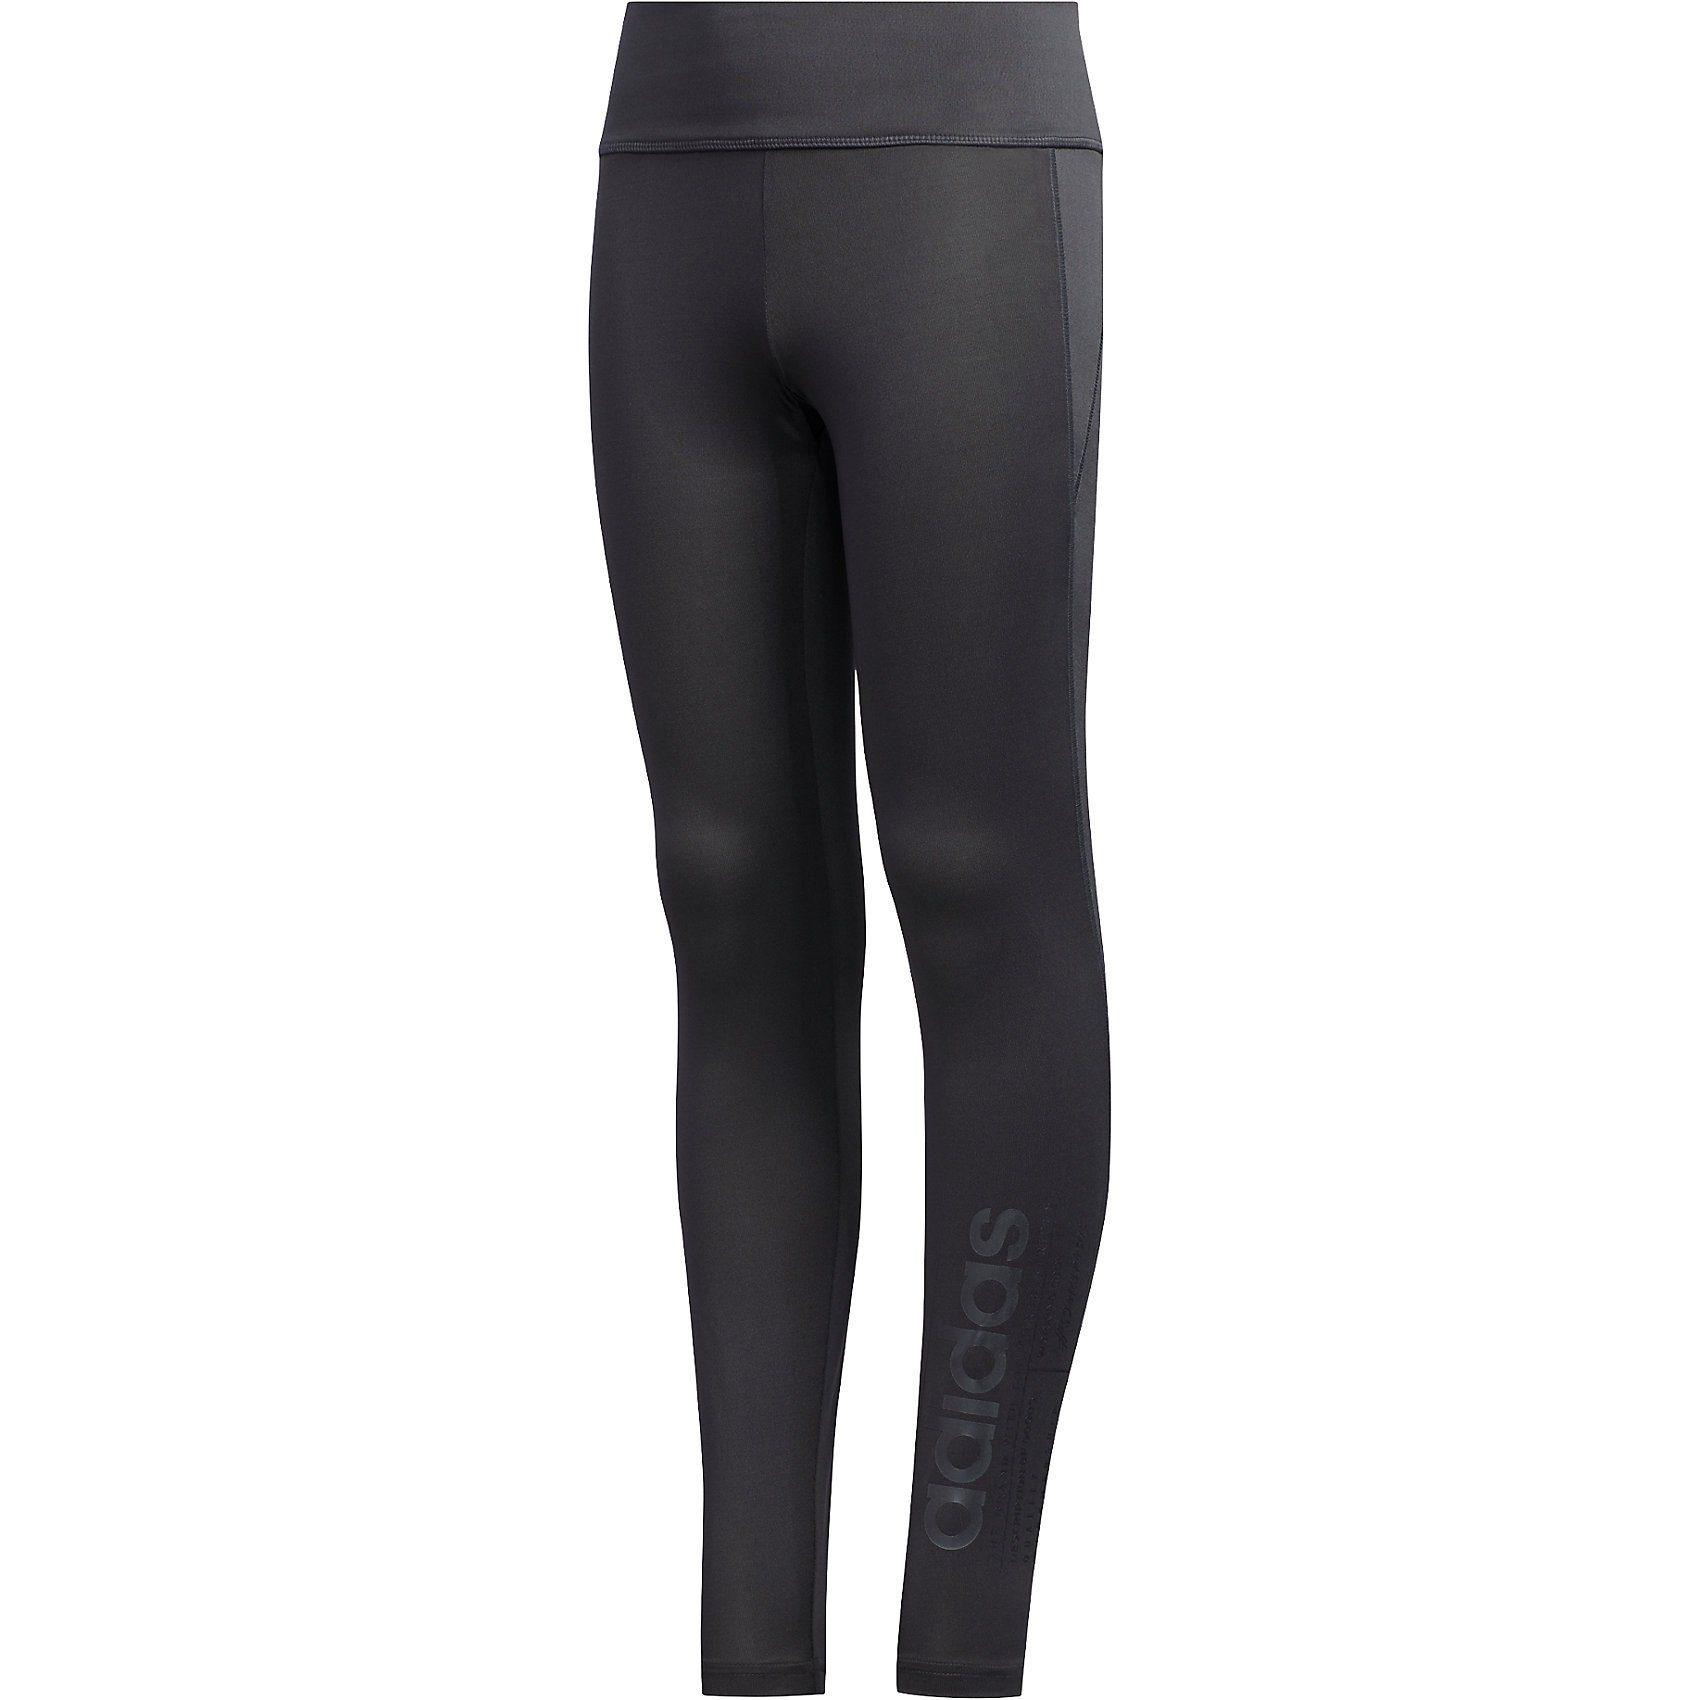 adidas Mädchen Sport Fitness Hose Kinder Essentials Linear Tight grau schwarz